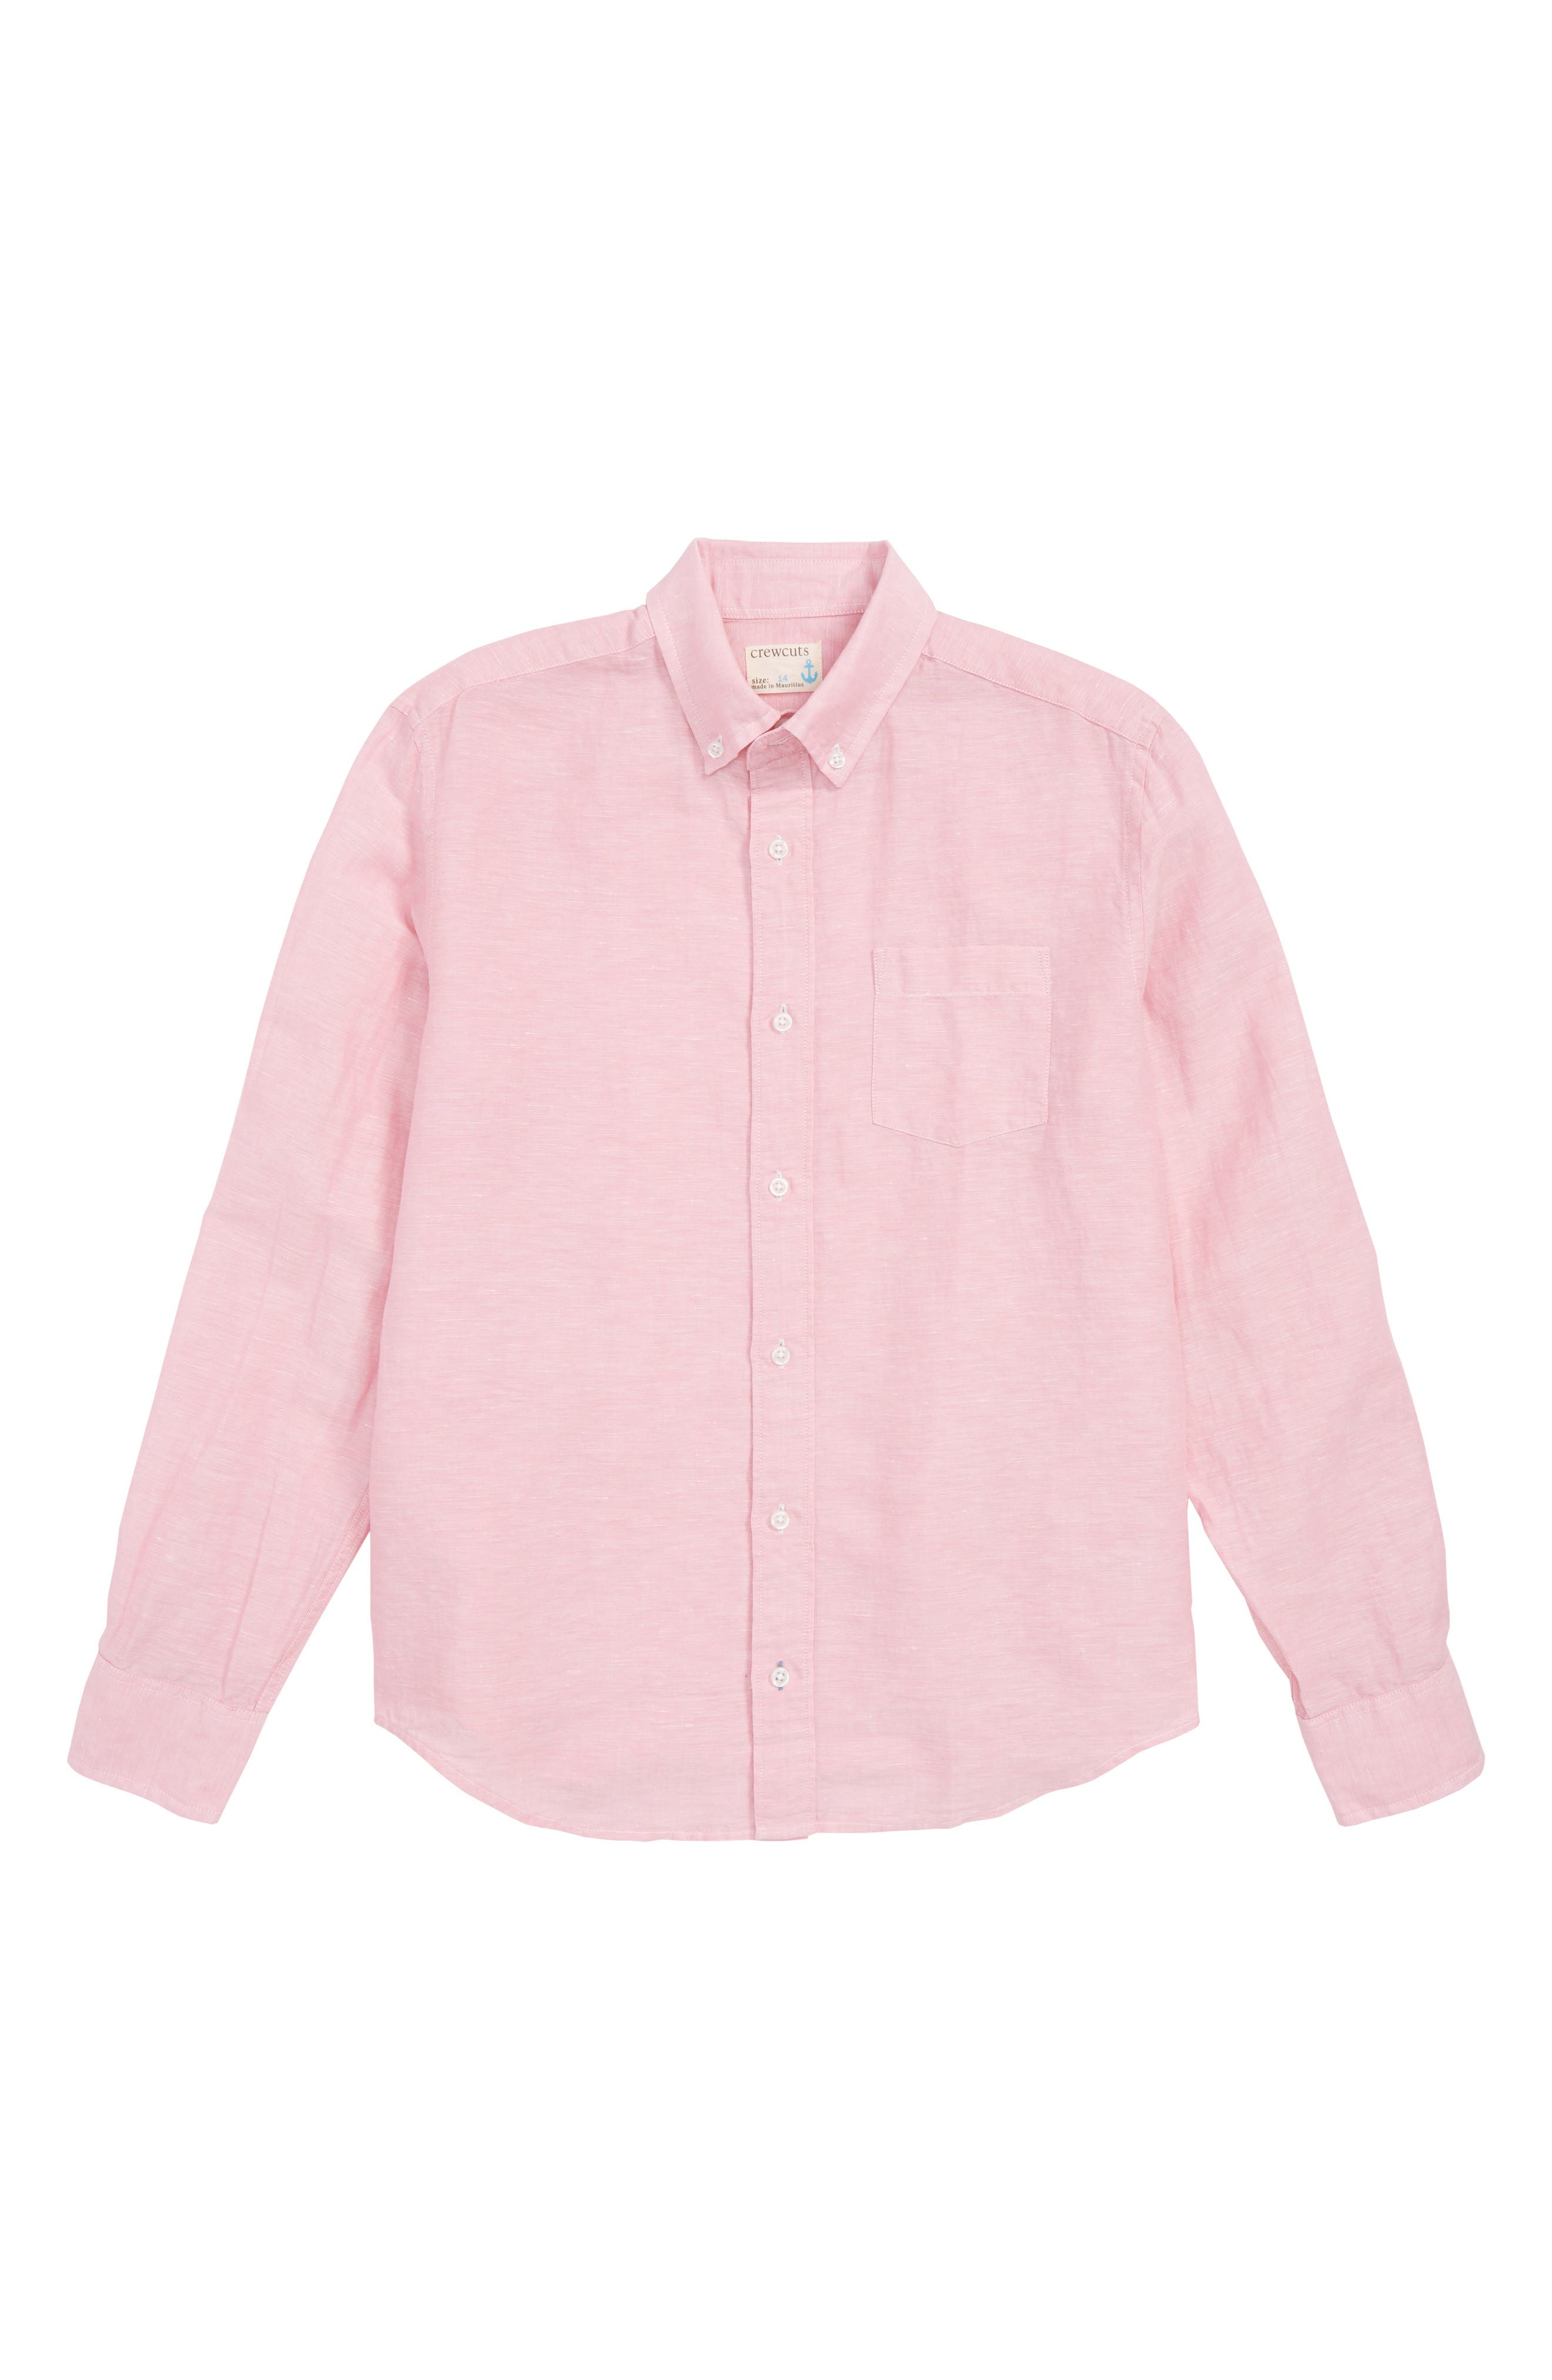 crewcuts by J.Crew Linen & Cotton Shirt